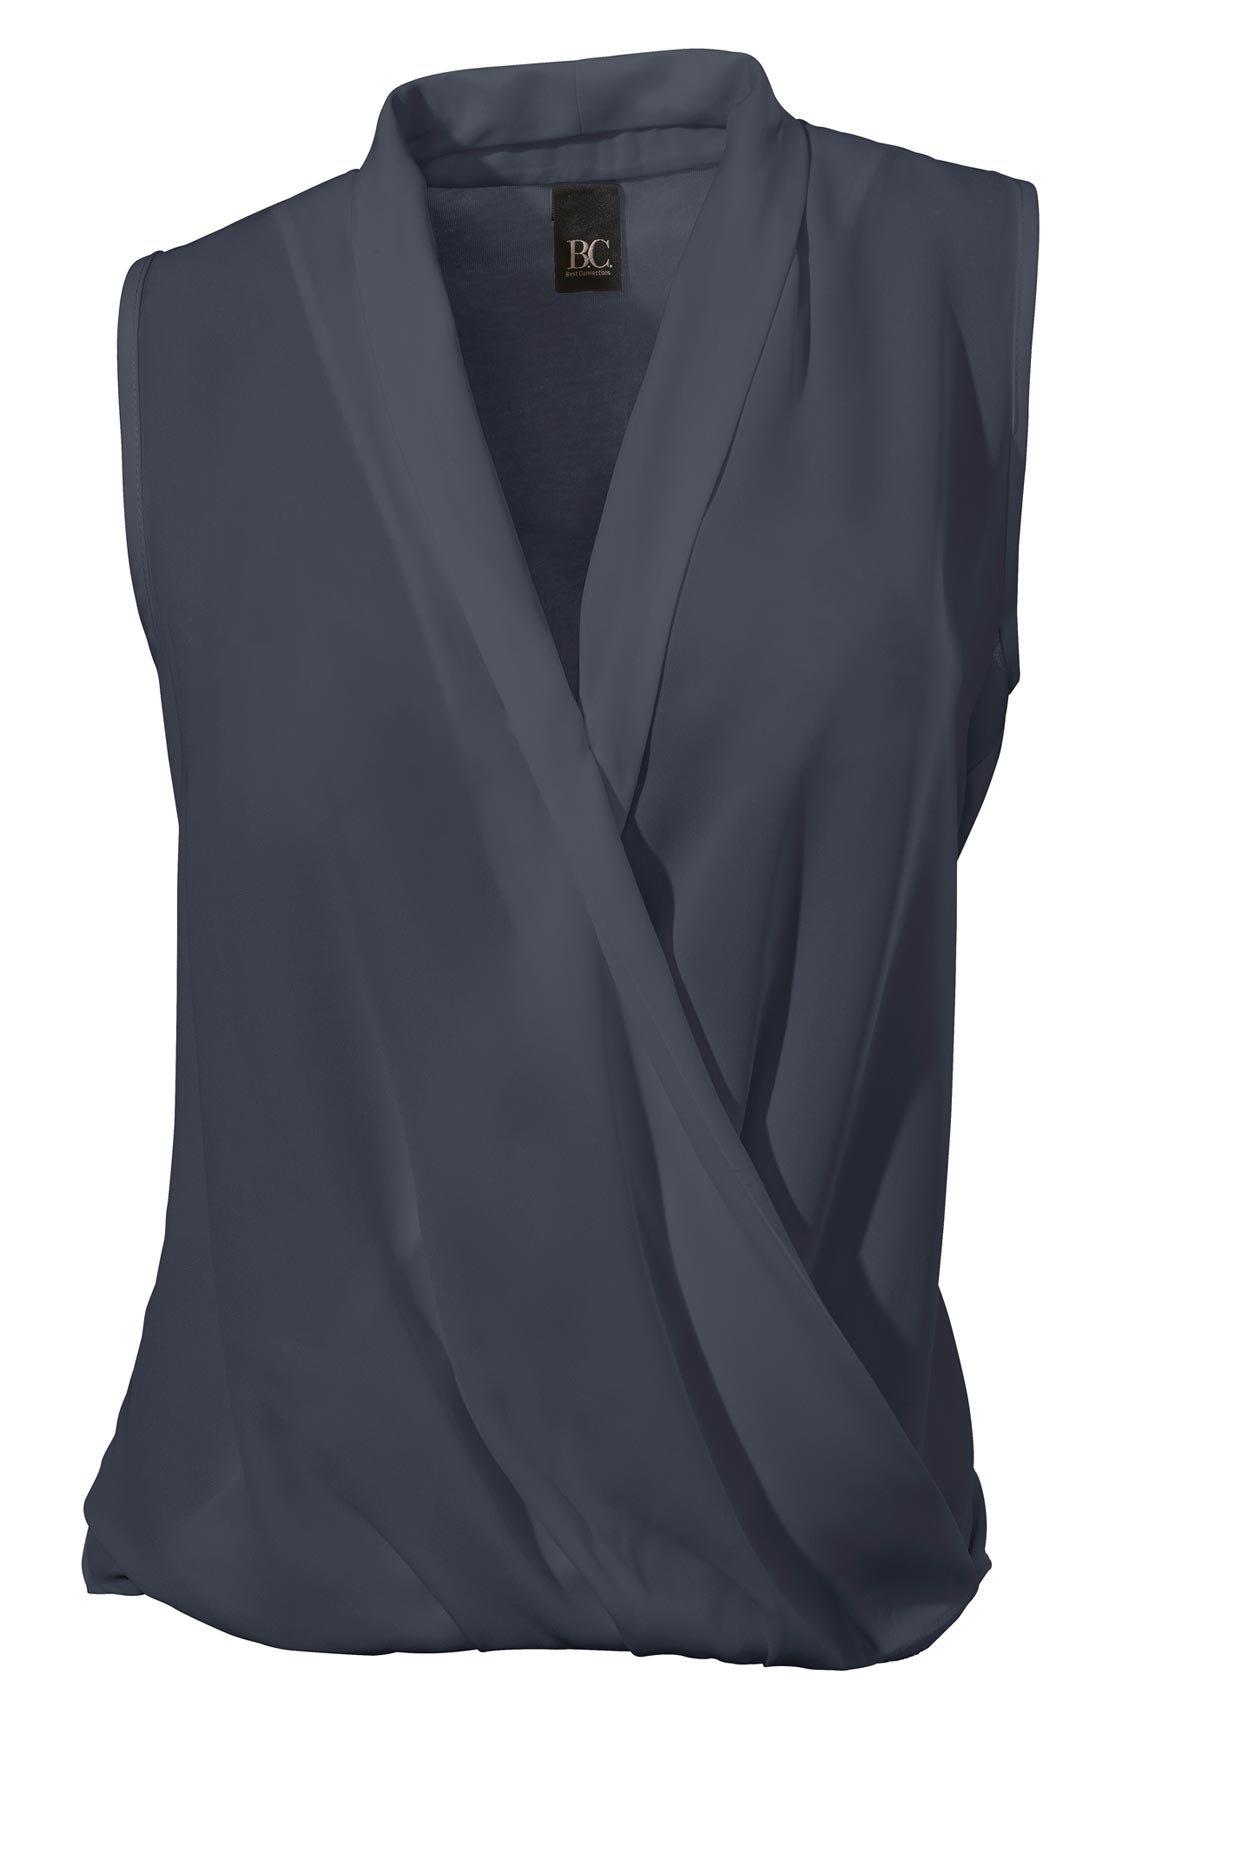 ASHLEY BROOKE by Heine shirttop voordelig en veilig online kopen